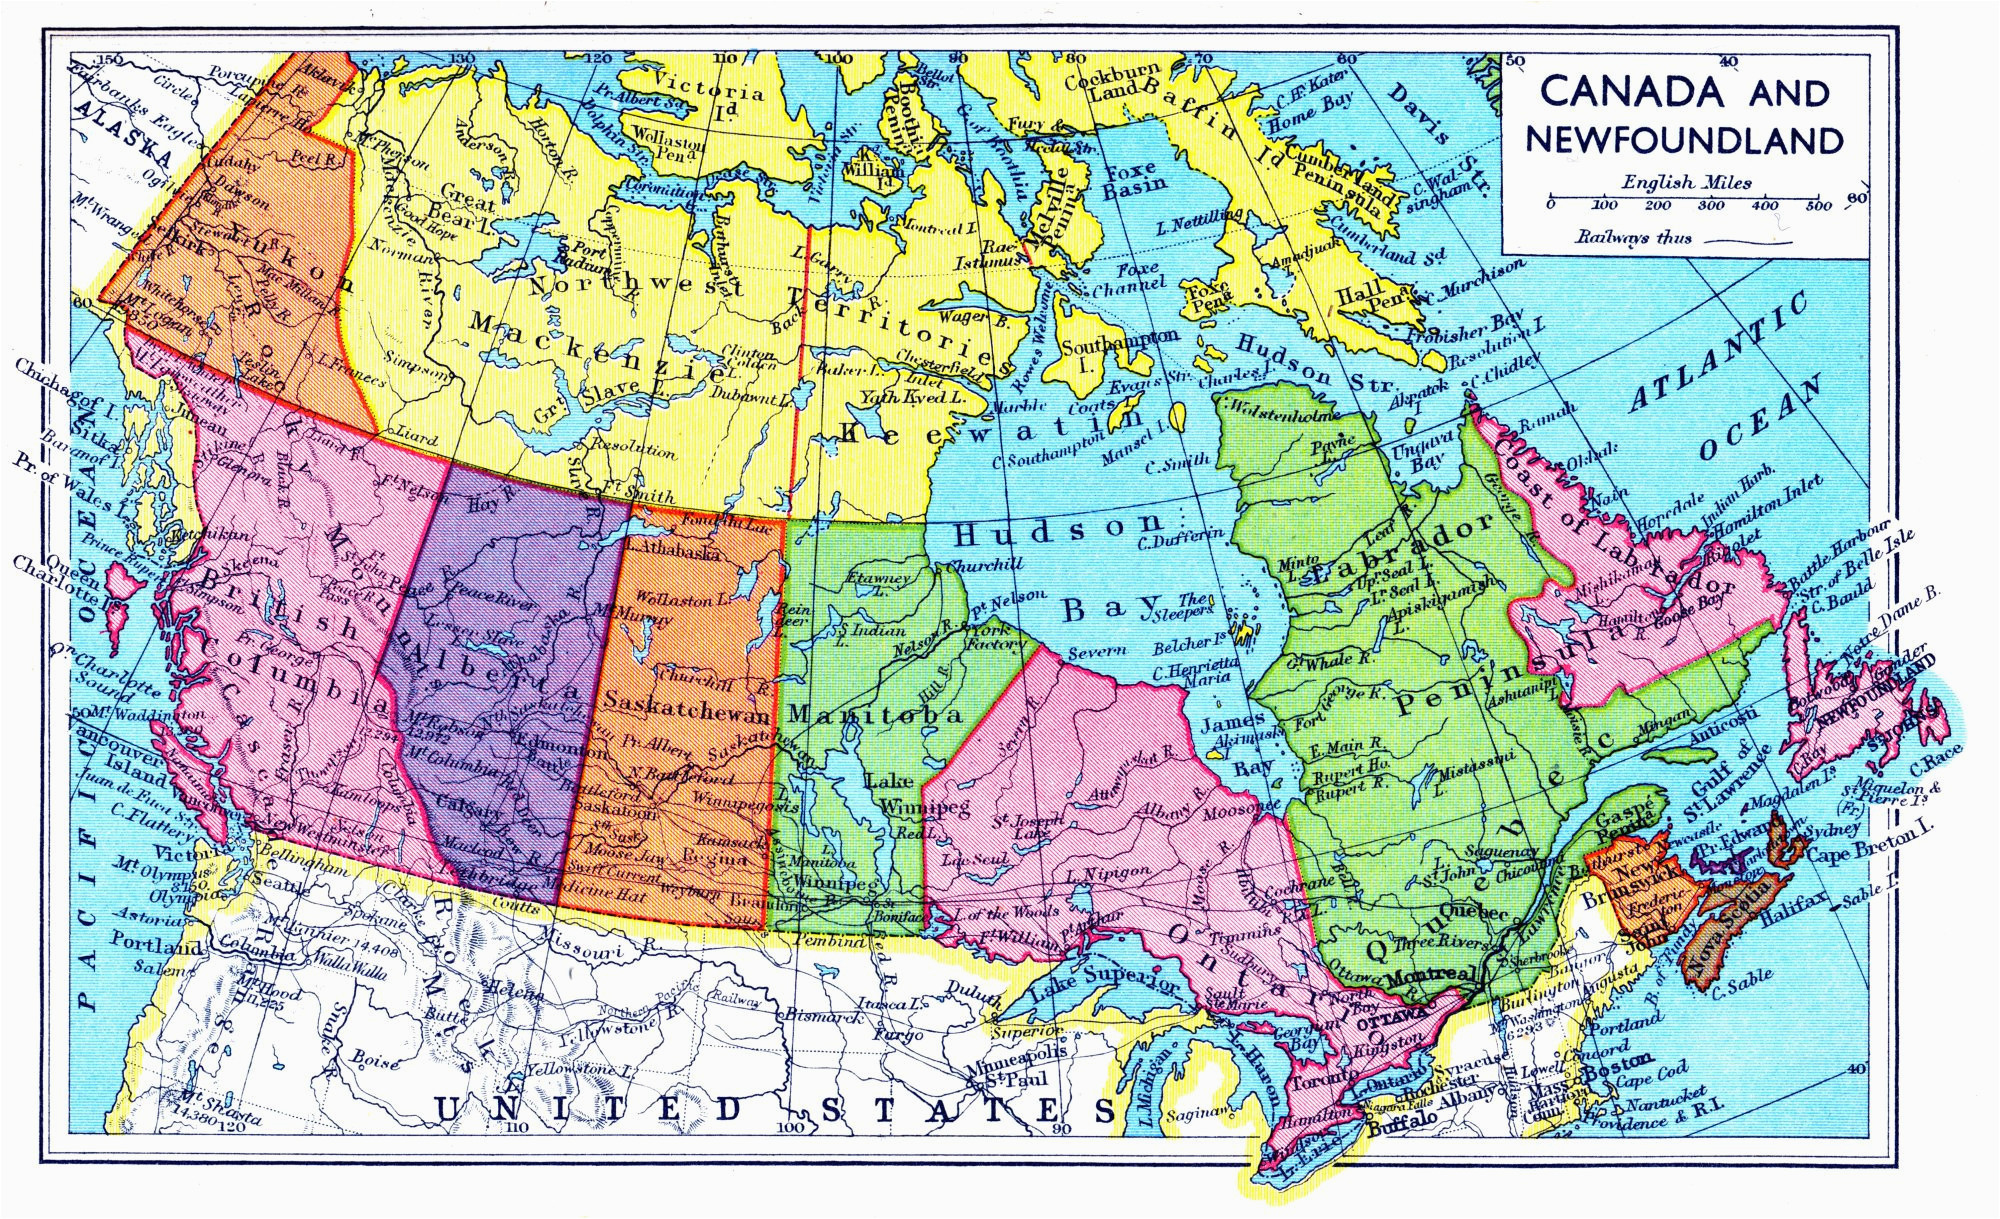 Ohio Earthquake Map World Earthquake Map Lovely Hayward Fault Zone ...